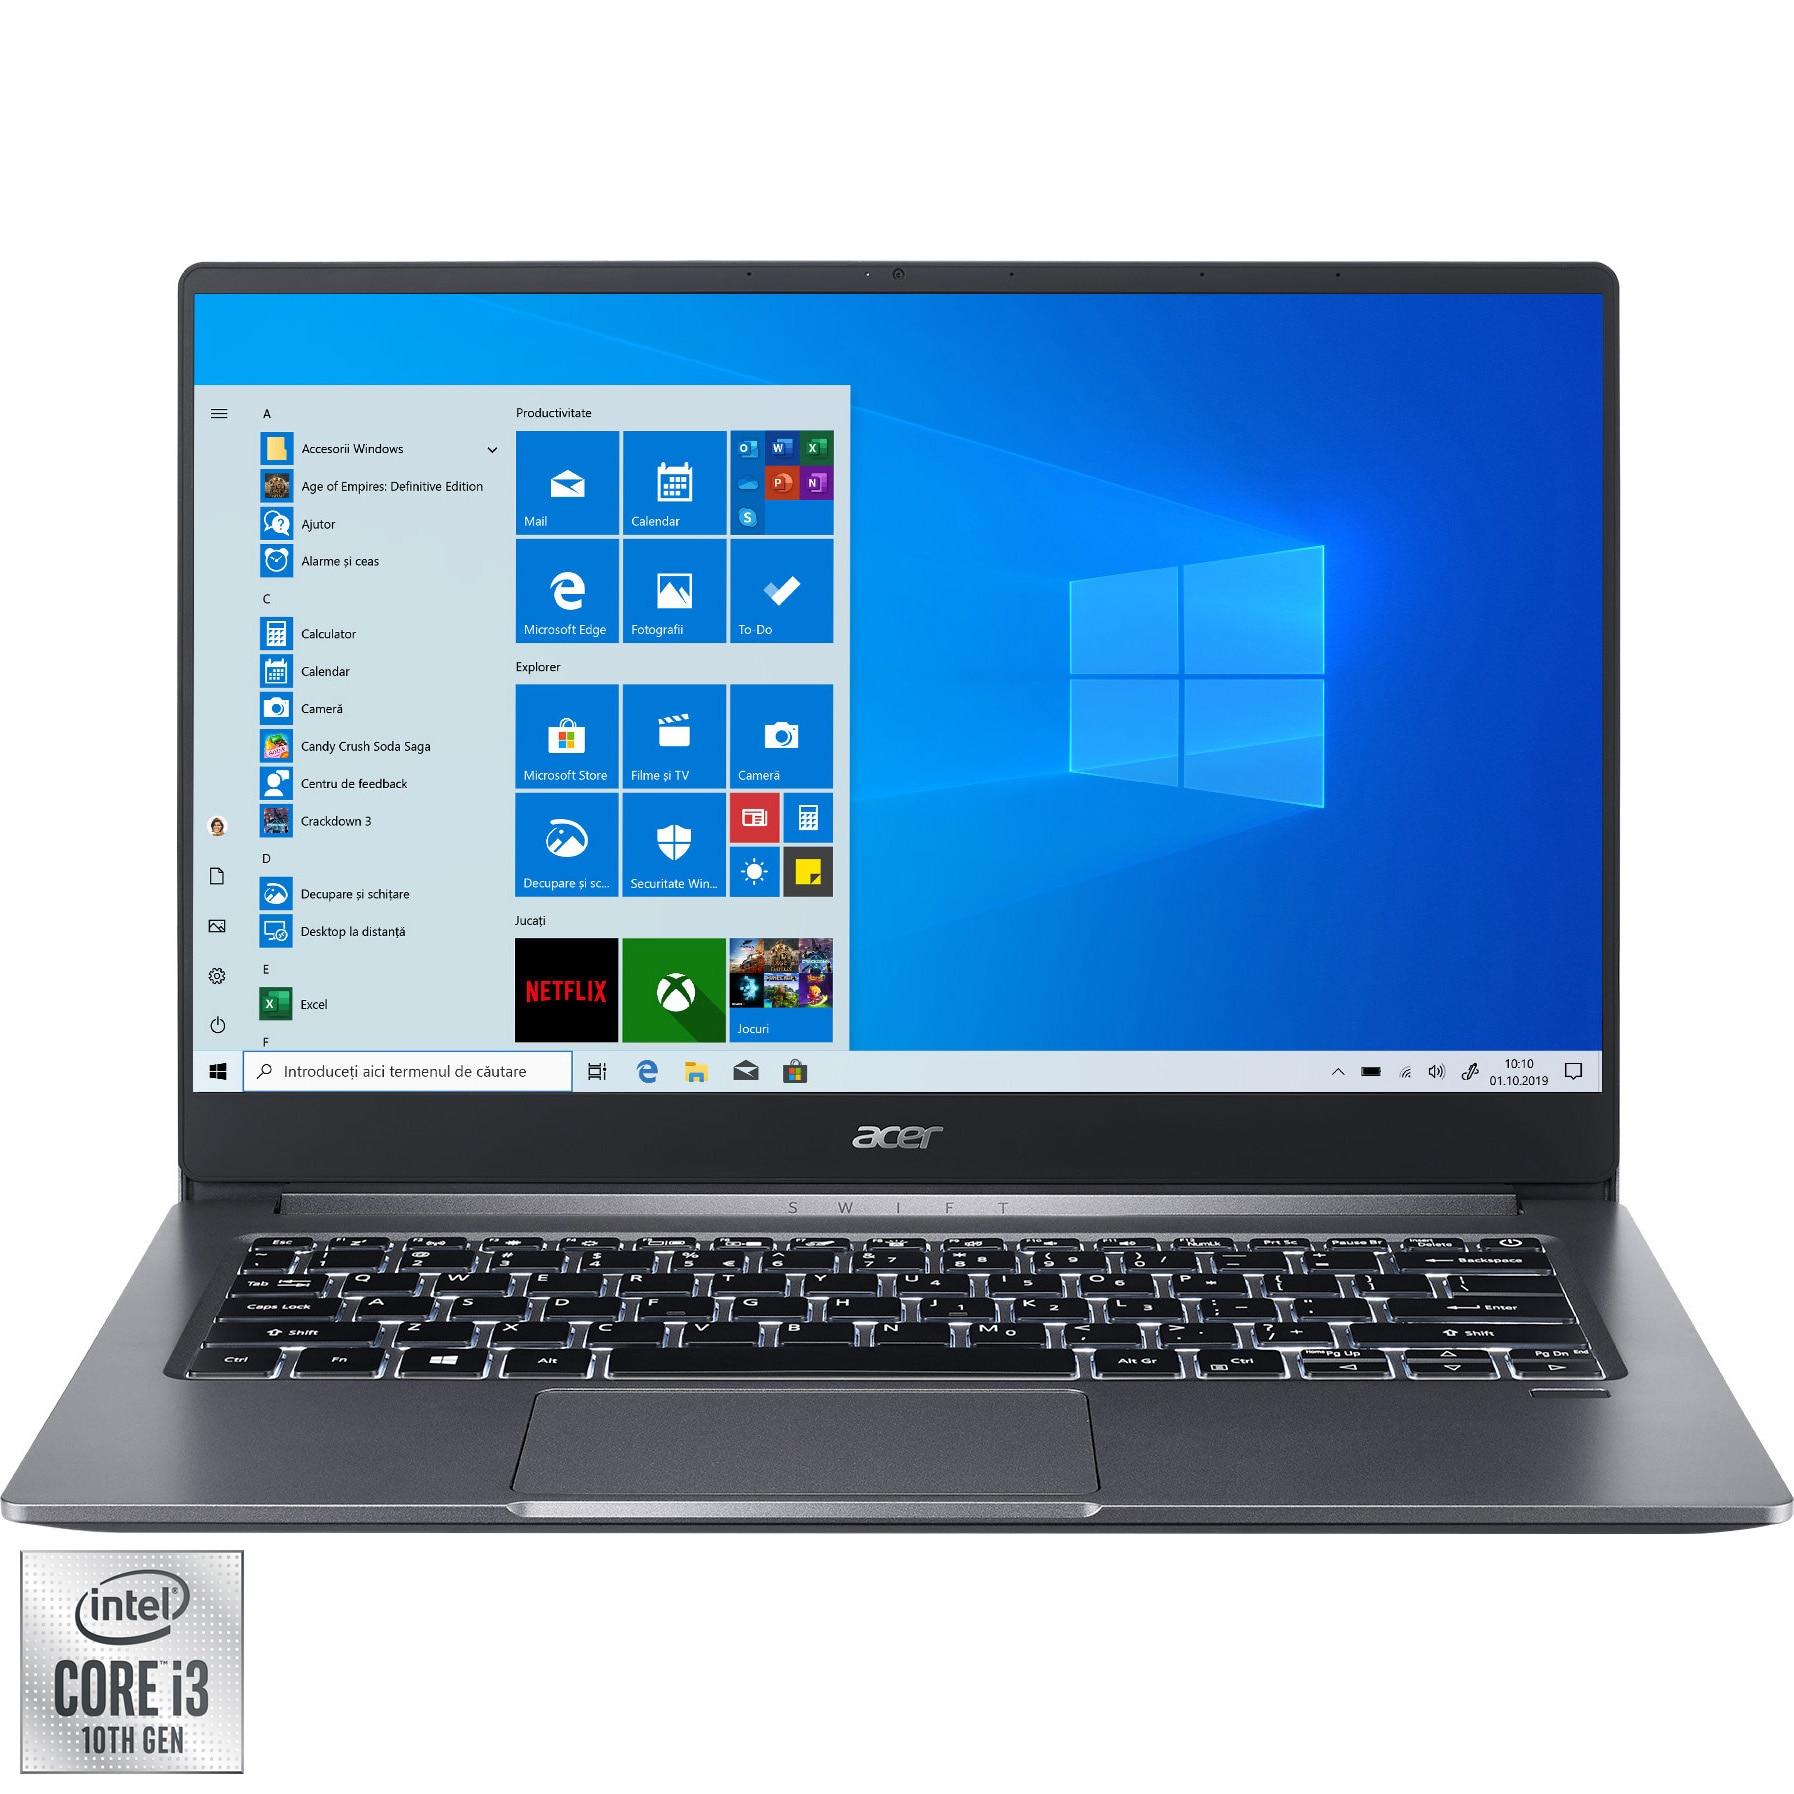 "Fotografie Laptop ultraportabil Acer Swift 3 SF314-57-34C8 cu procesor Intel® Core™ i3-1005G1 pana la 3.40 GHz, 14"", Full HD, IPS, 8GB, 512GB SSD, Intel UHD Graphics, Windows 10 Home, Steel Gray"